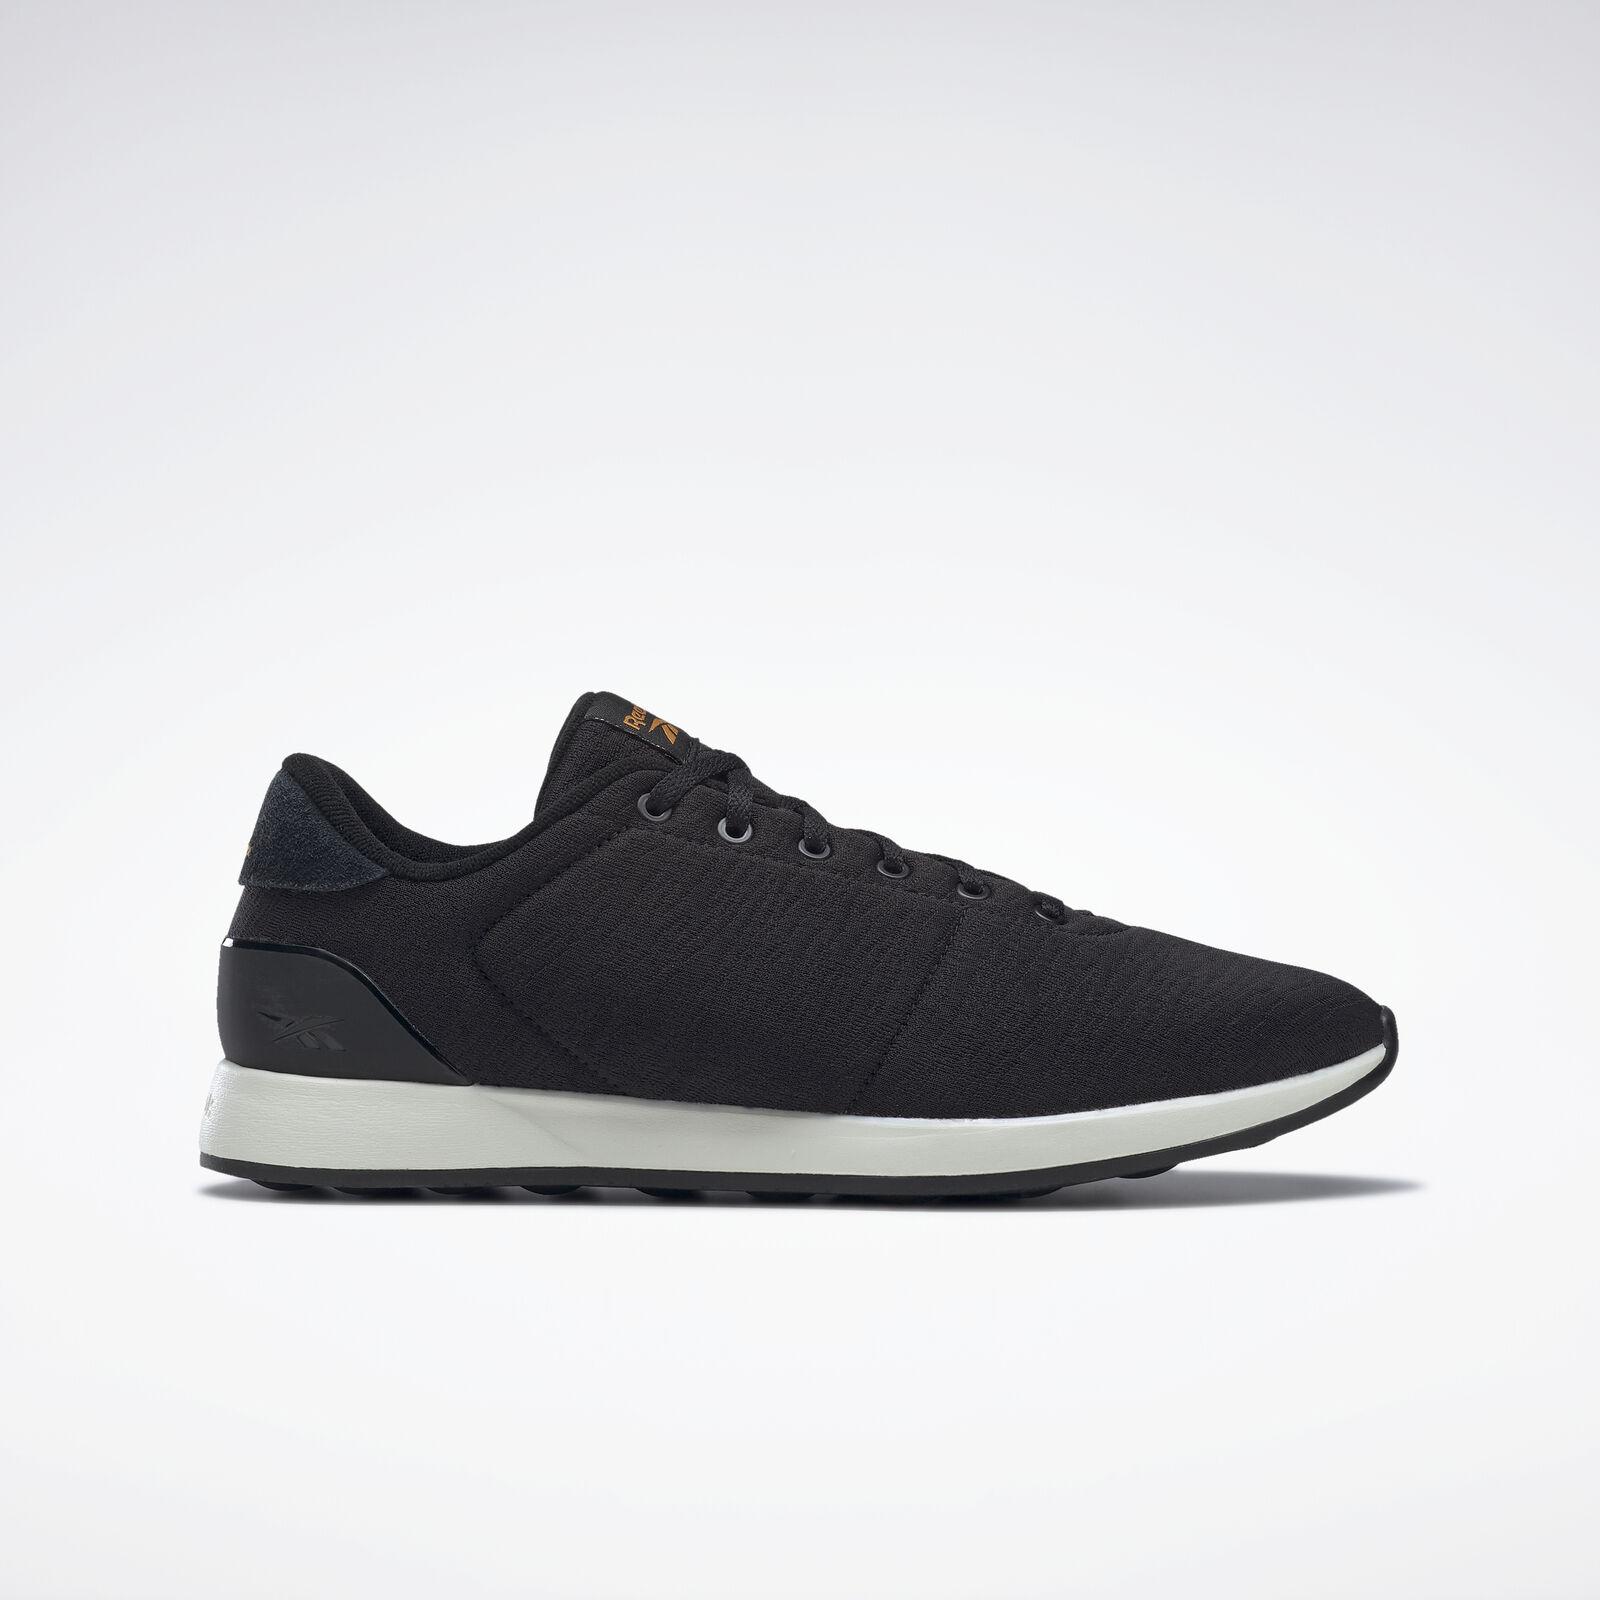 Reebok Men's Ever Road DMX 4 Shoe (Cor eBlack) $22.93 + Free Shipping